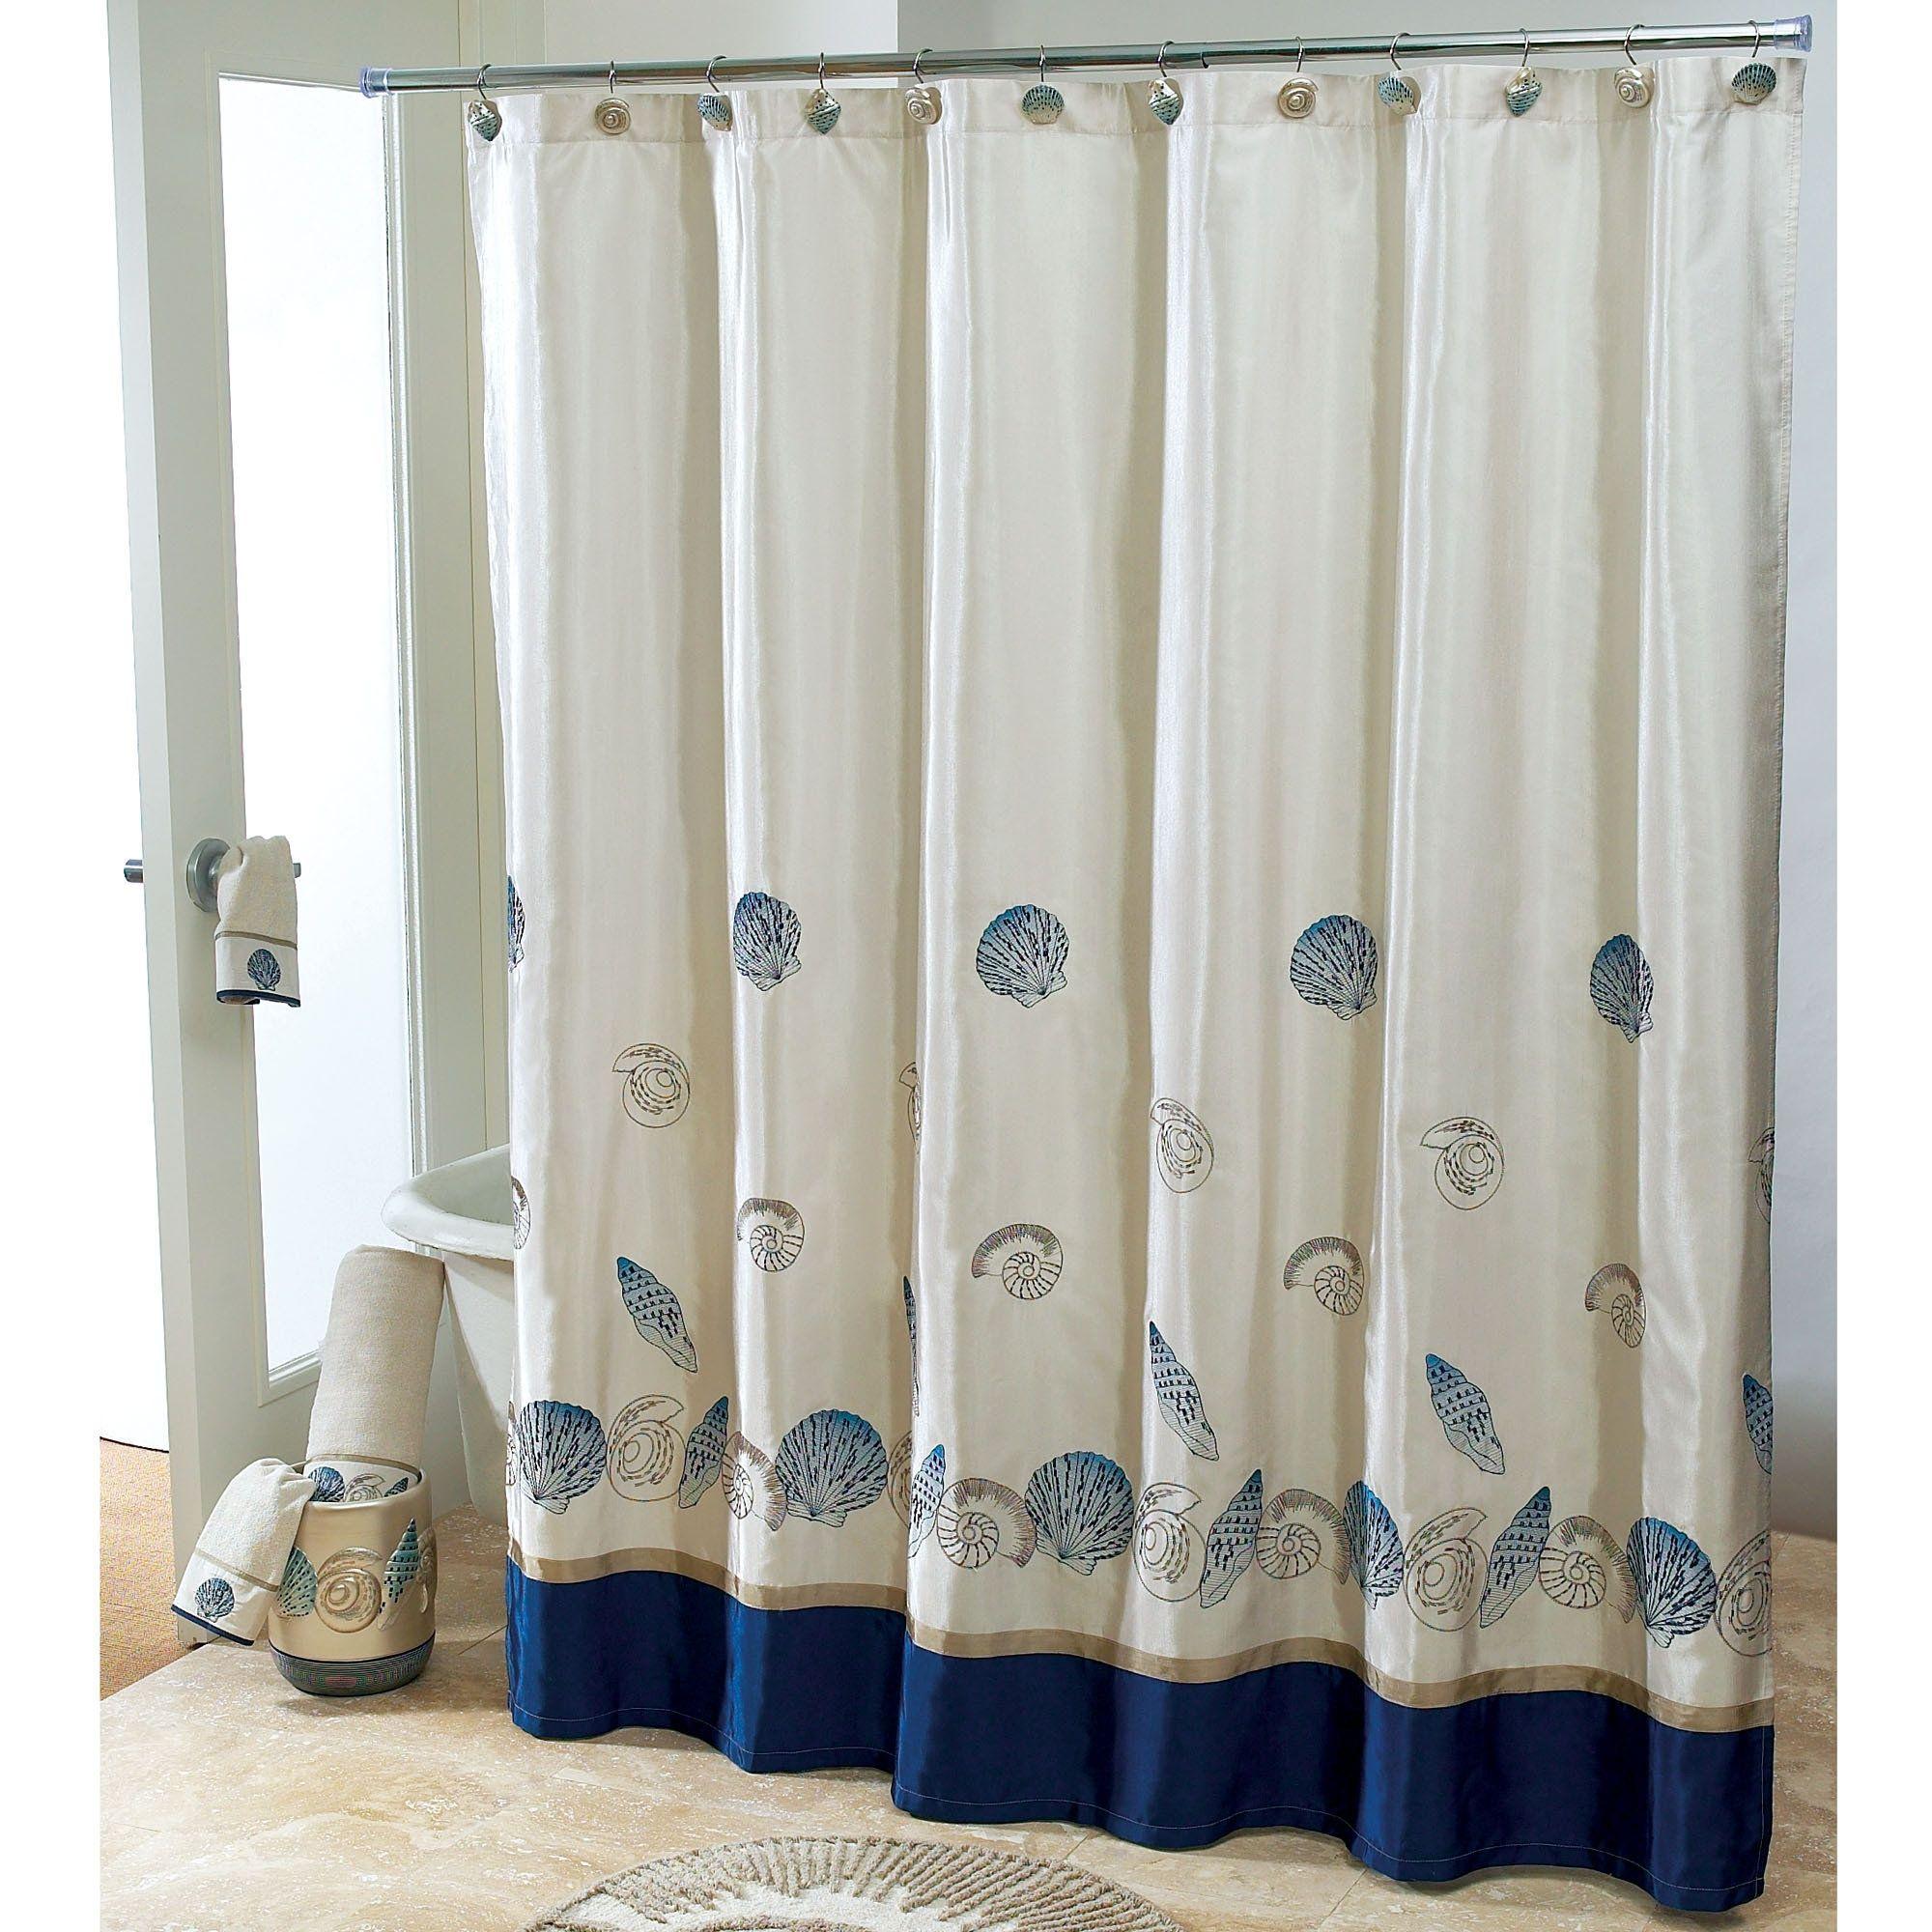 Ocean bathroom window curtains realtagfo pinterest